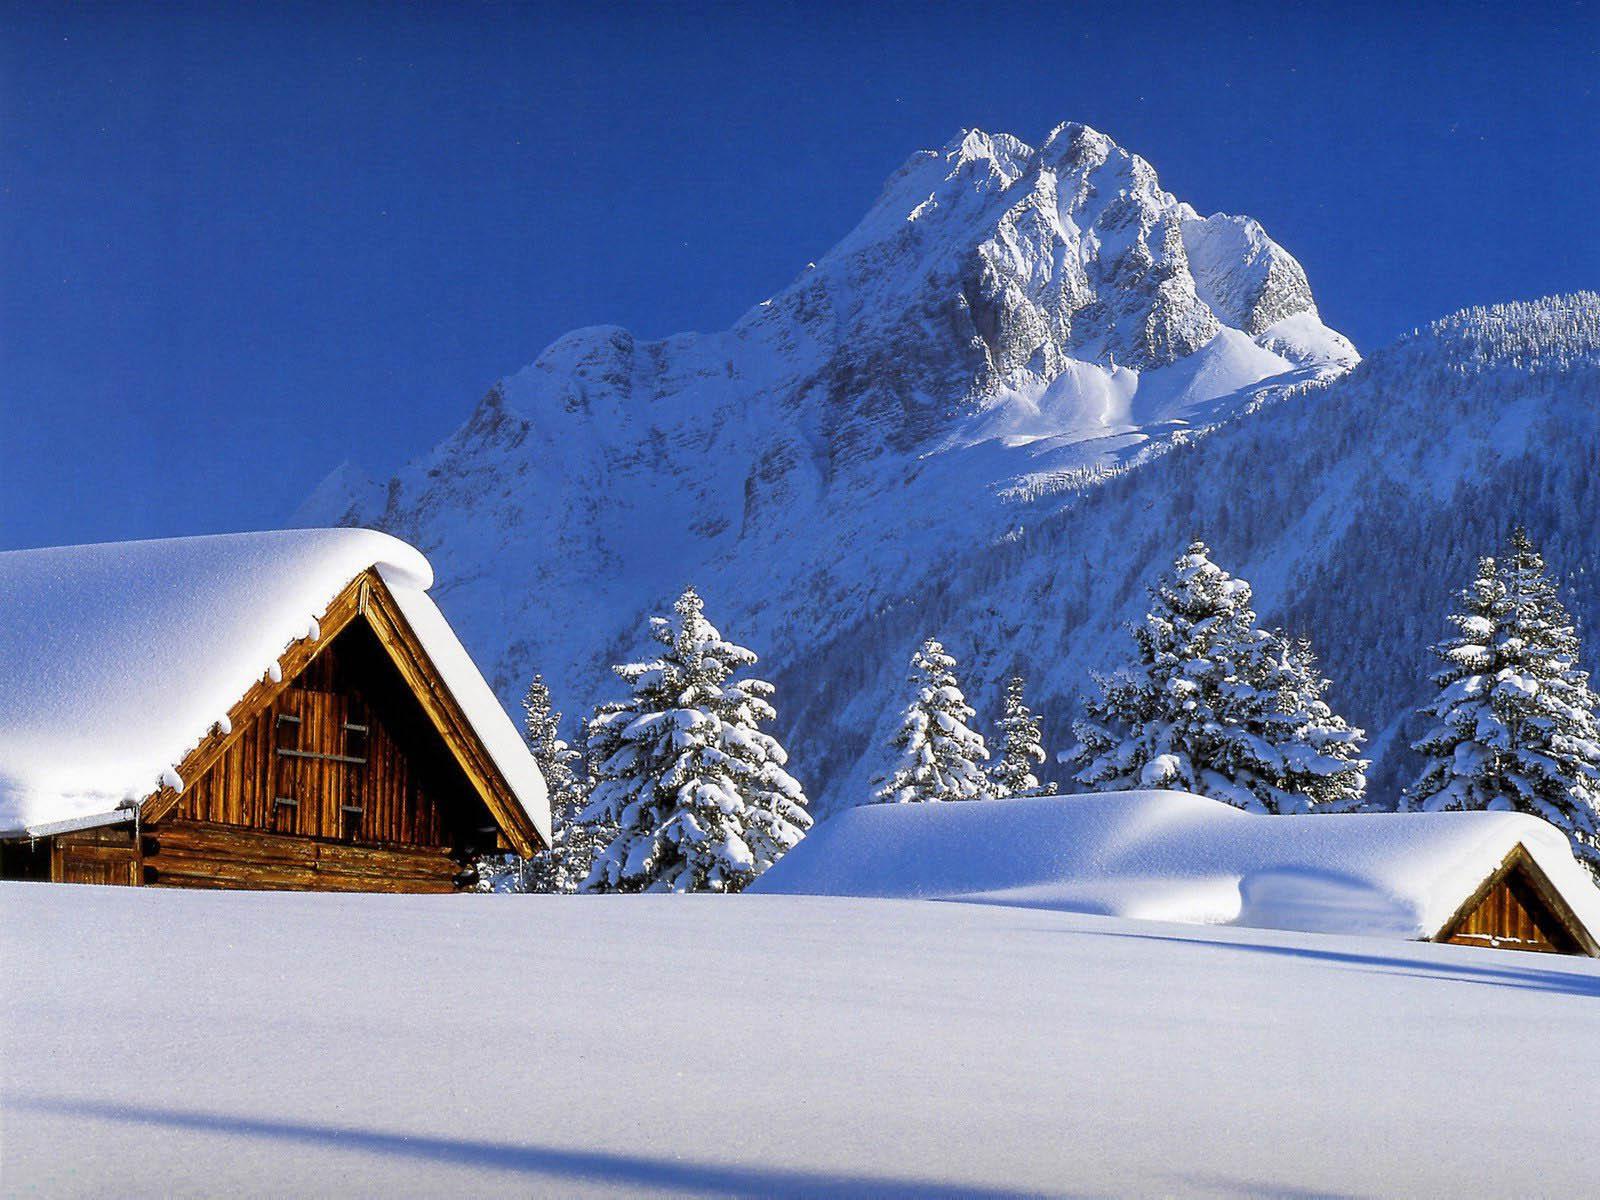 Free Snow Wallpapers For Desktop - Wallpaper Cave